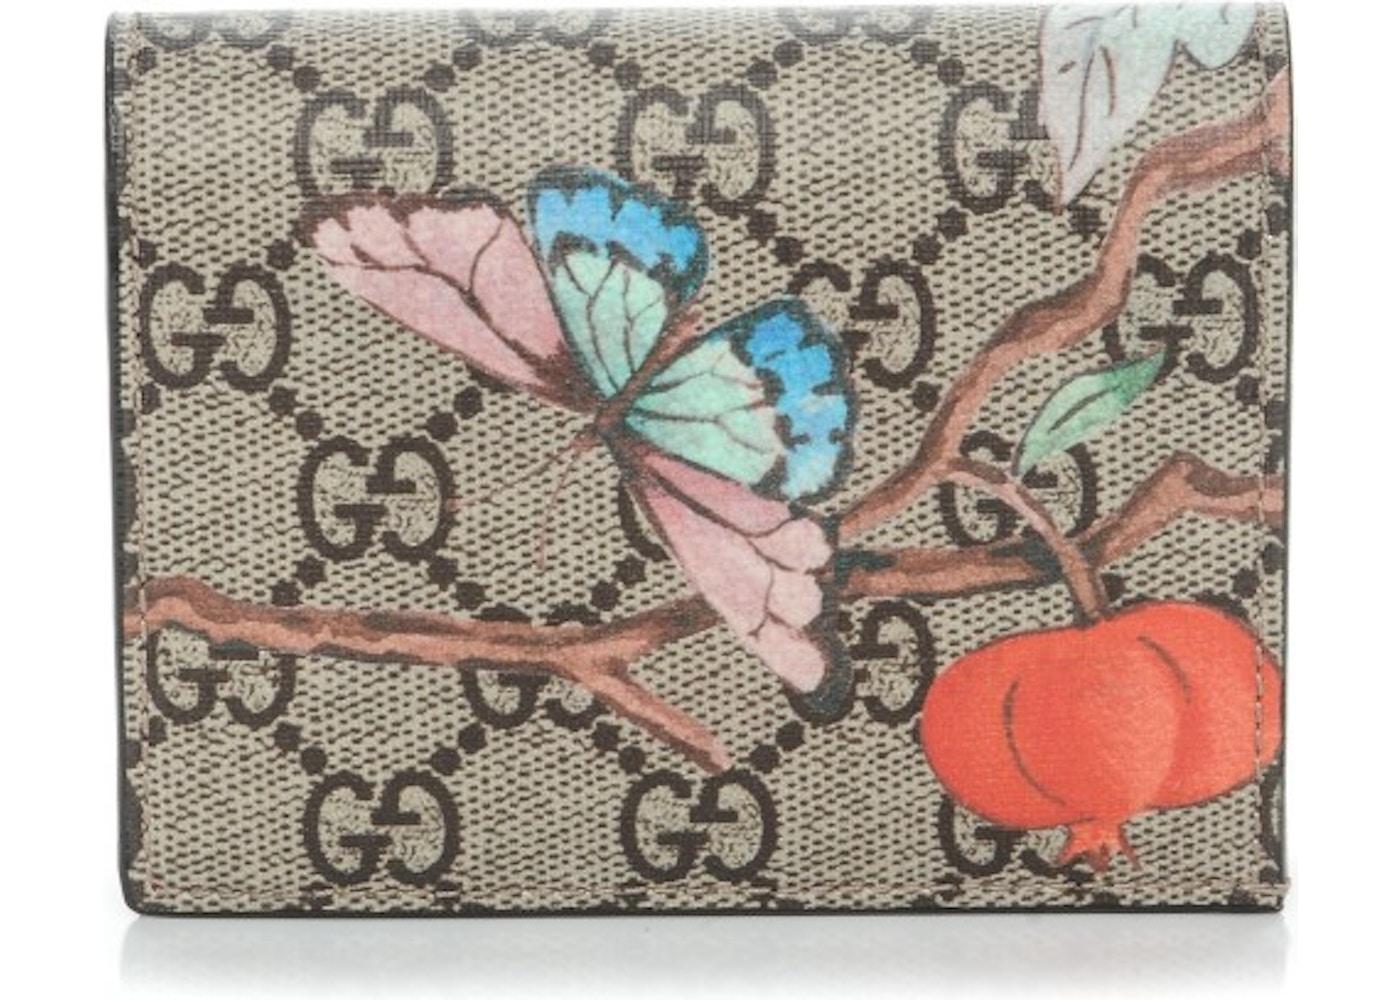 a6146ba6d2de Gucci Card Case Wallet Monogram GG Supreme Tian Print Brown ...